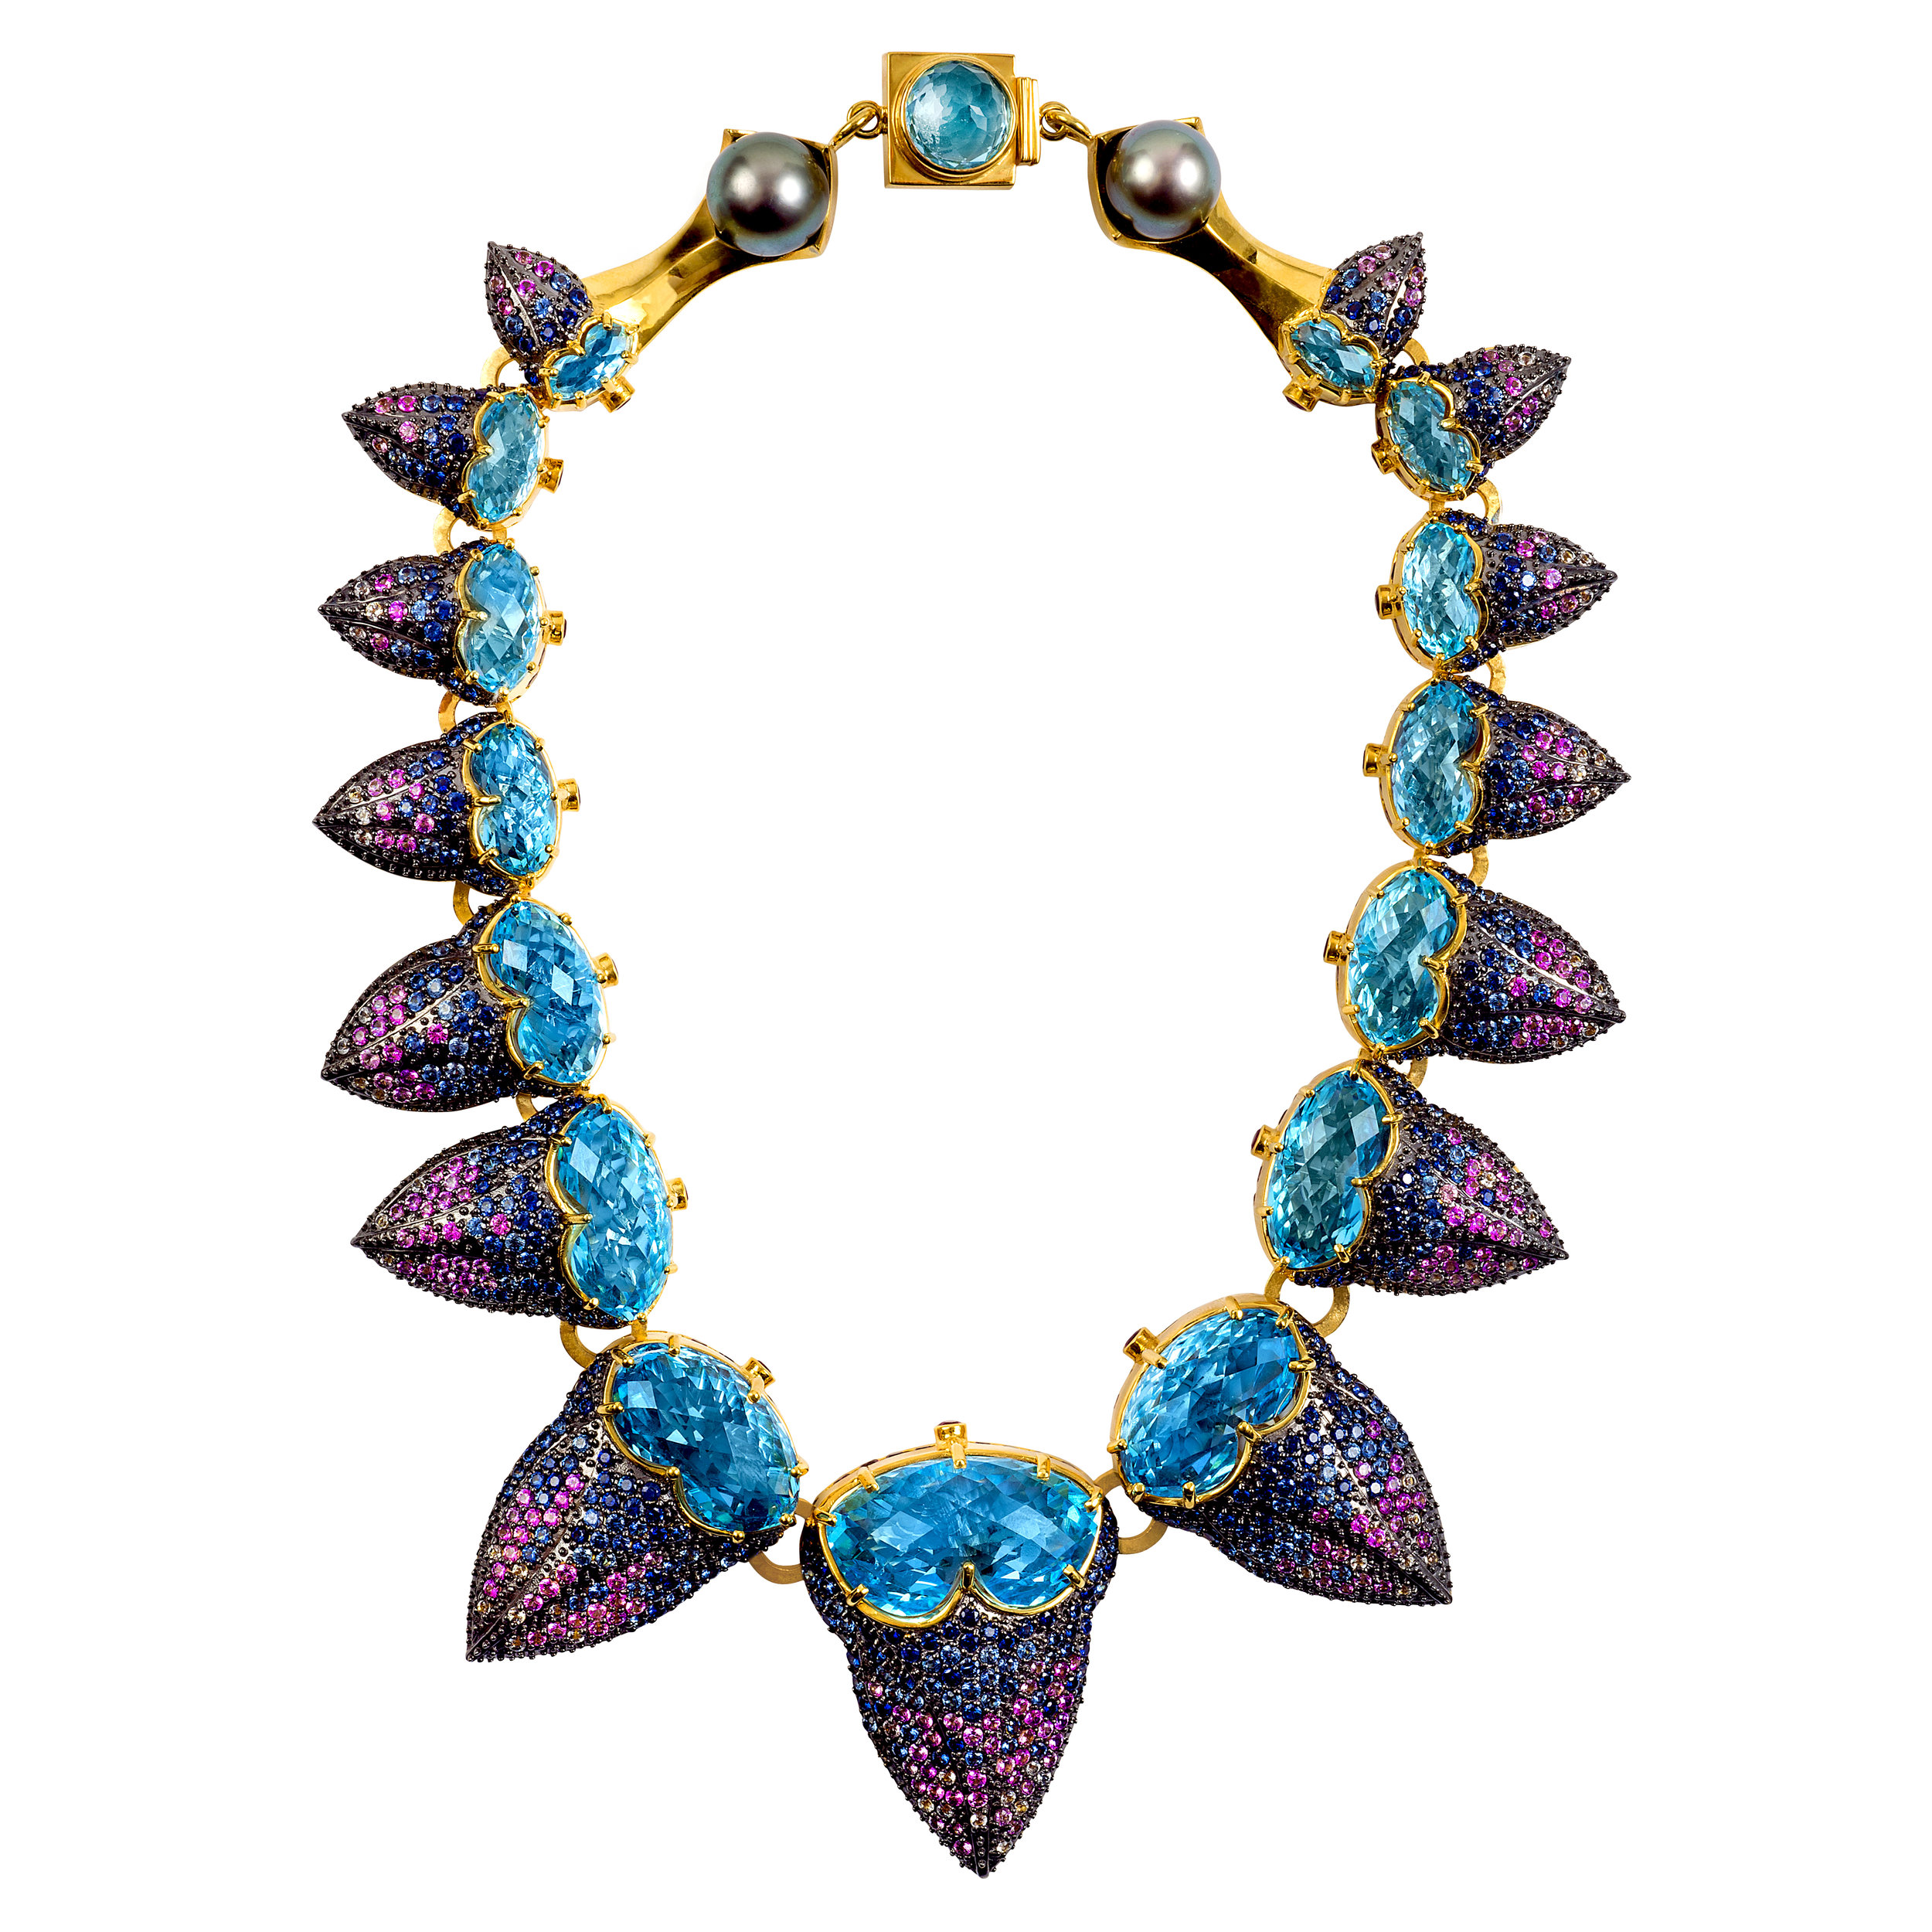 Purple Acorn Necklace - Atelier Swarovski by Matthew Campbell Laurenza, photo by Andrew Werner.jpg